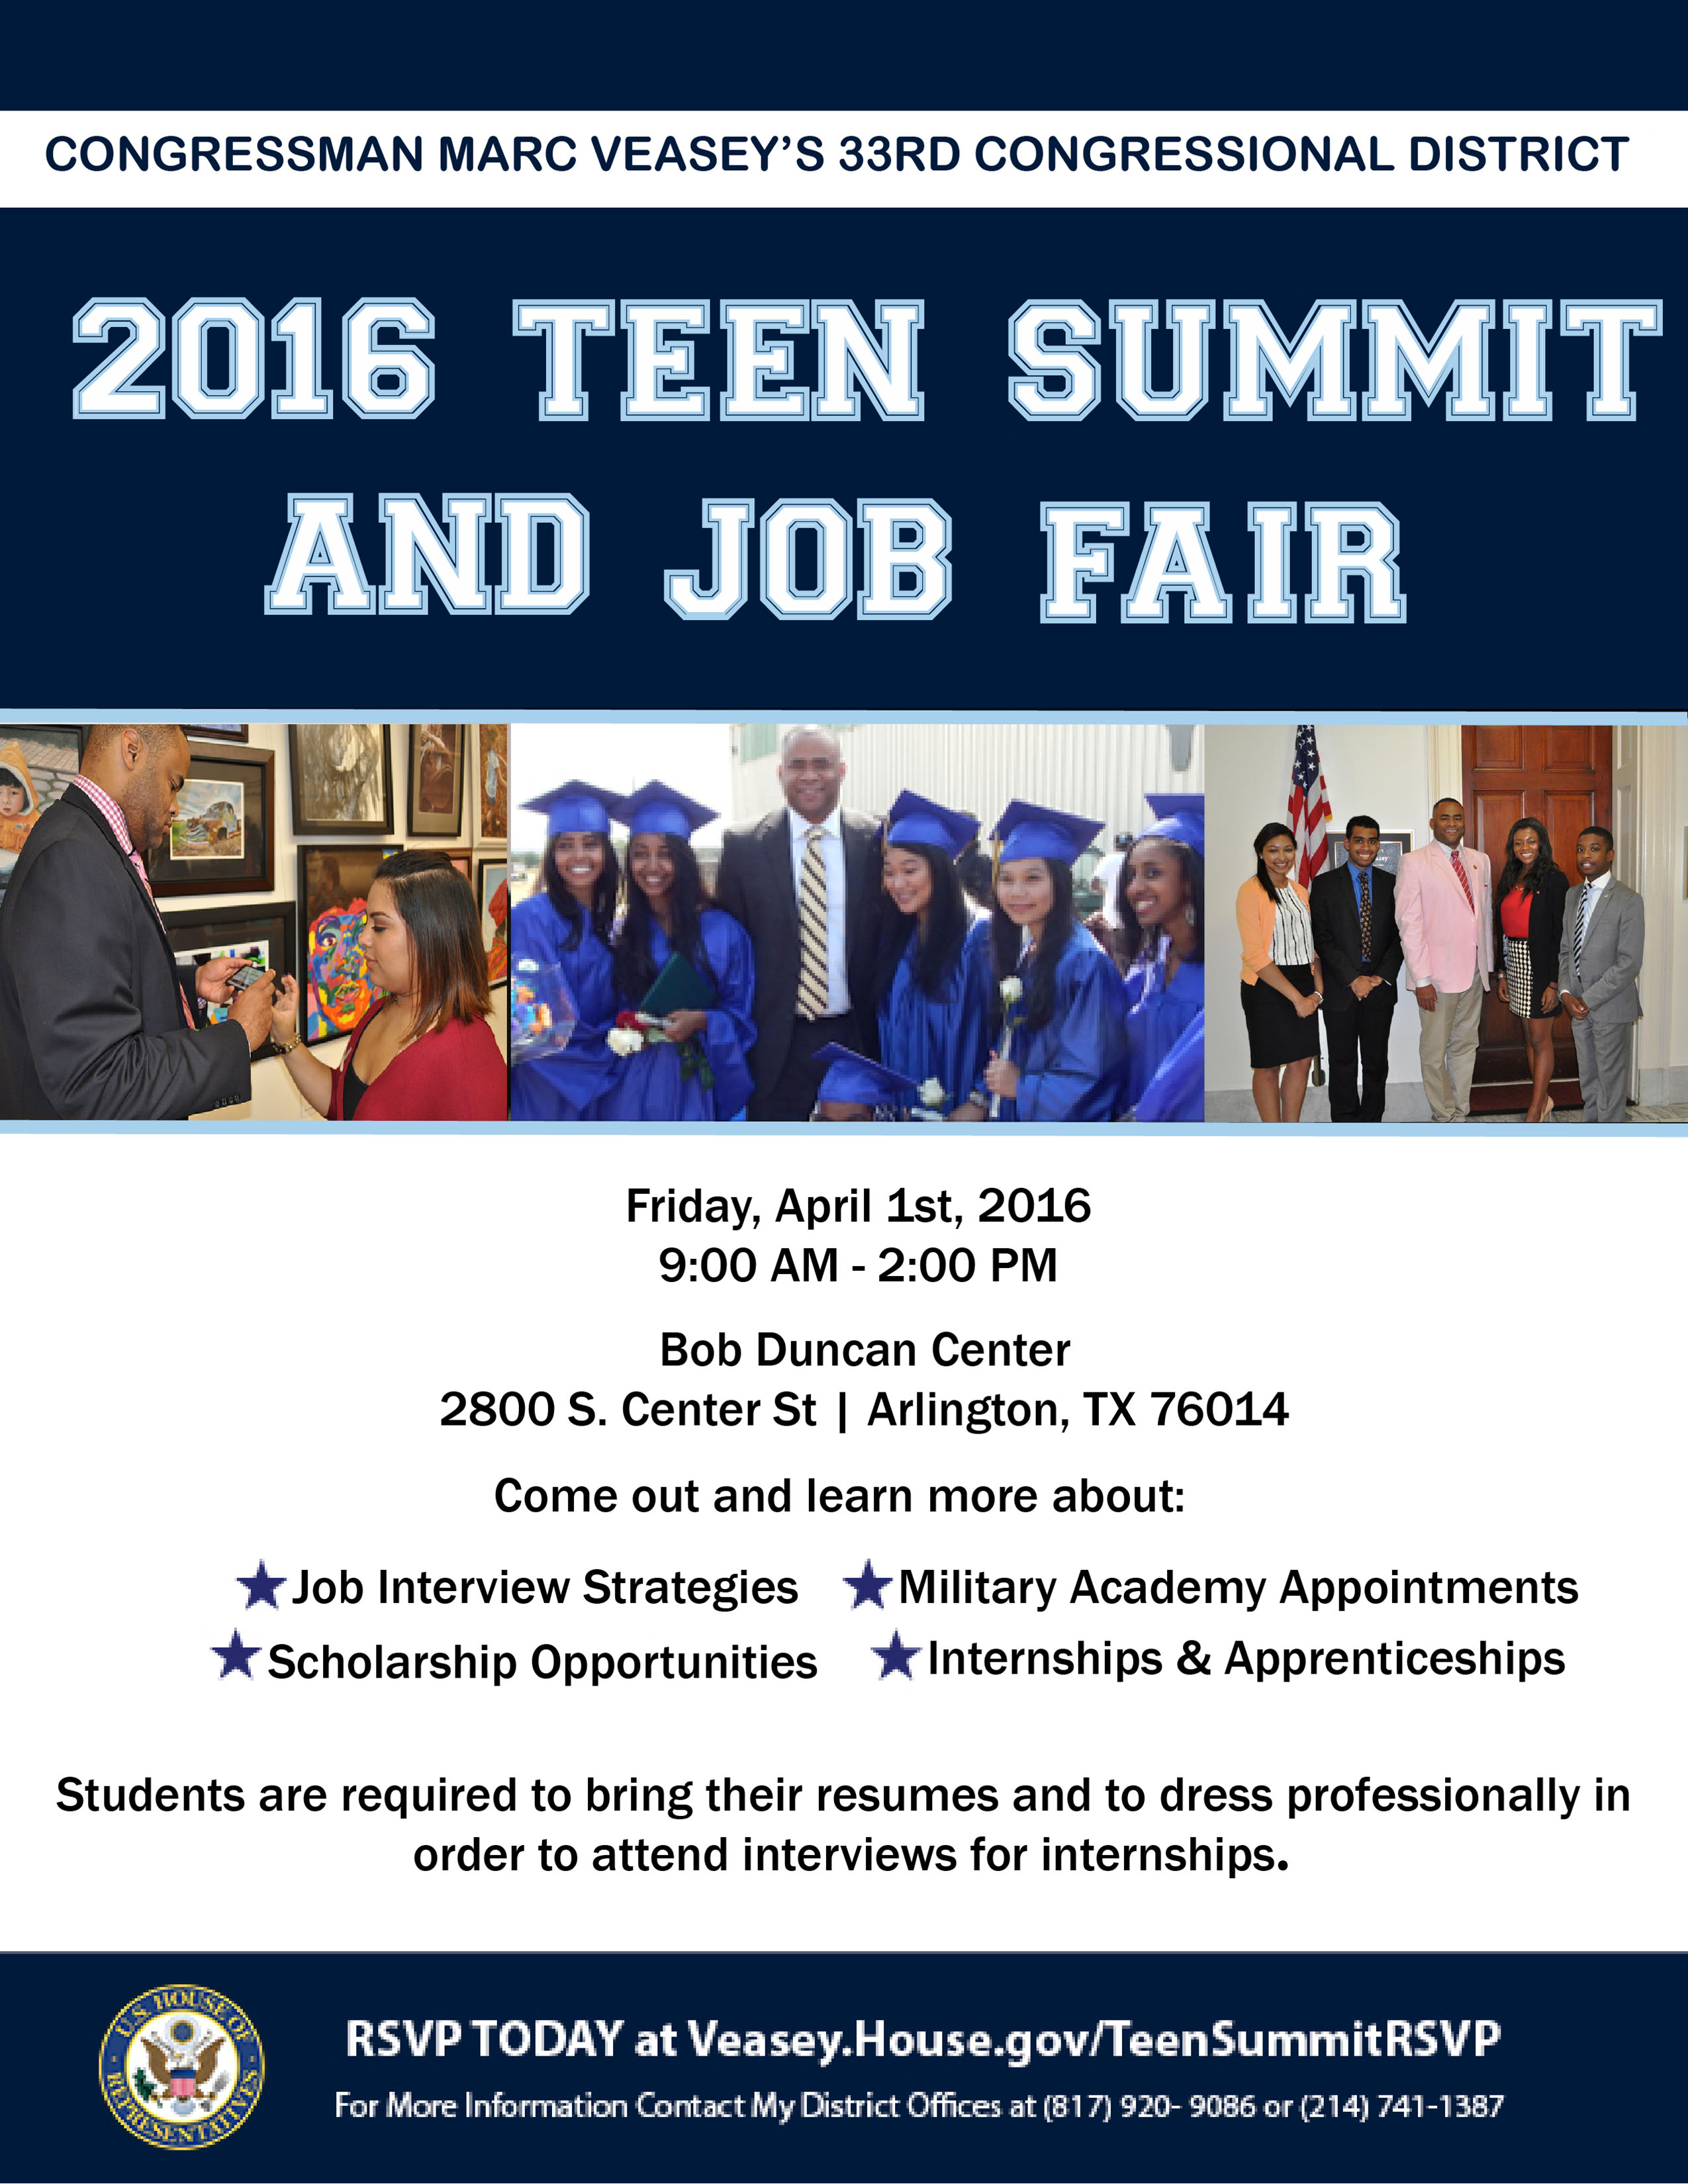 3rd annual 33rd congressional district teen summit job fair congressman veasey s 2016 teen summit